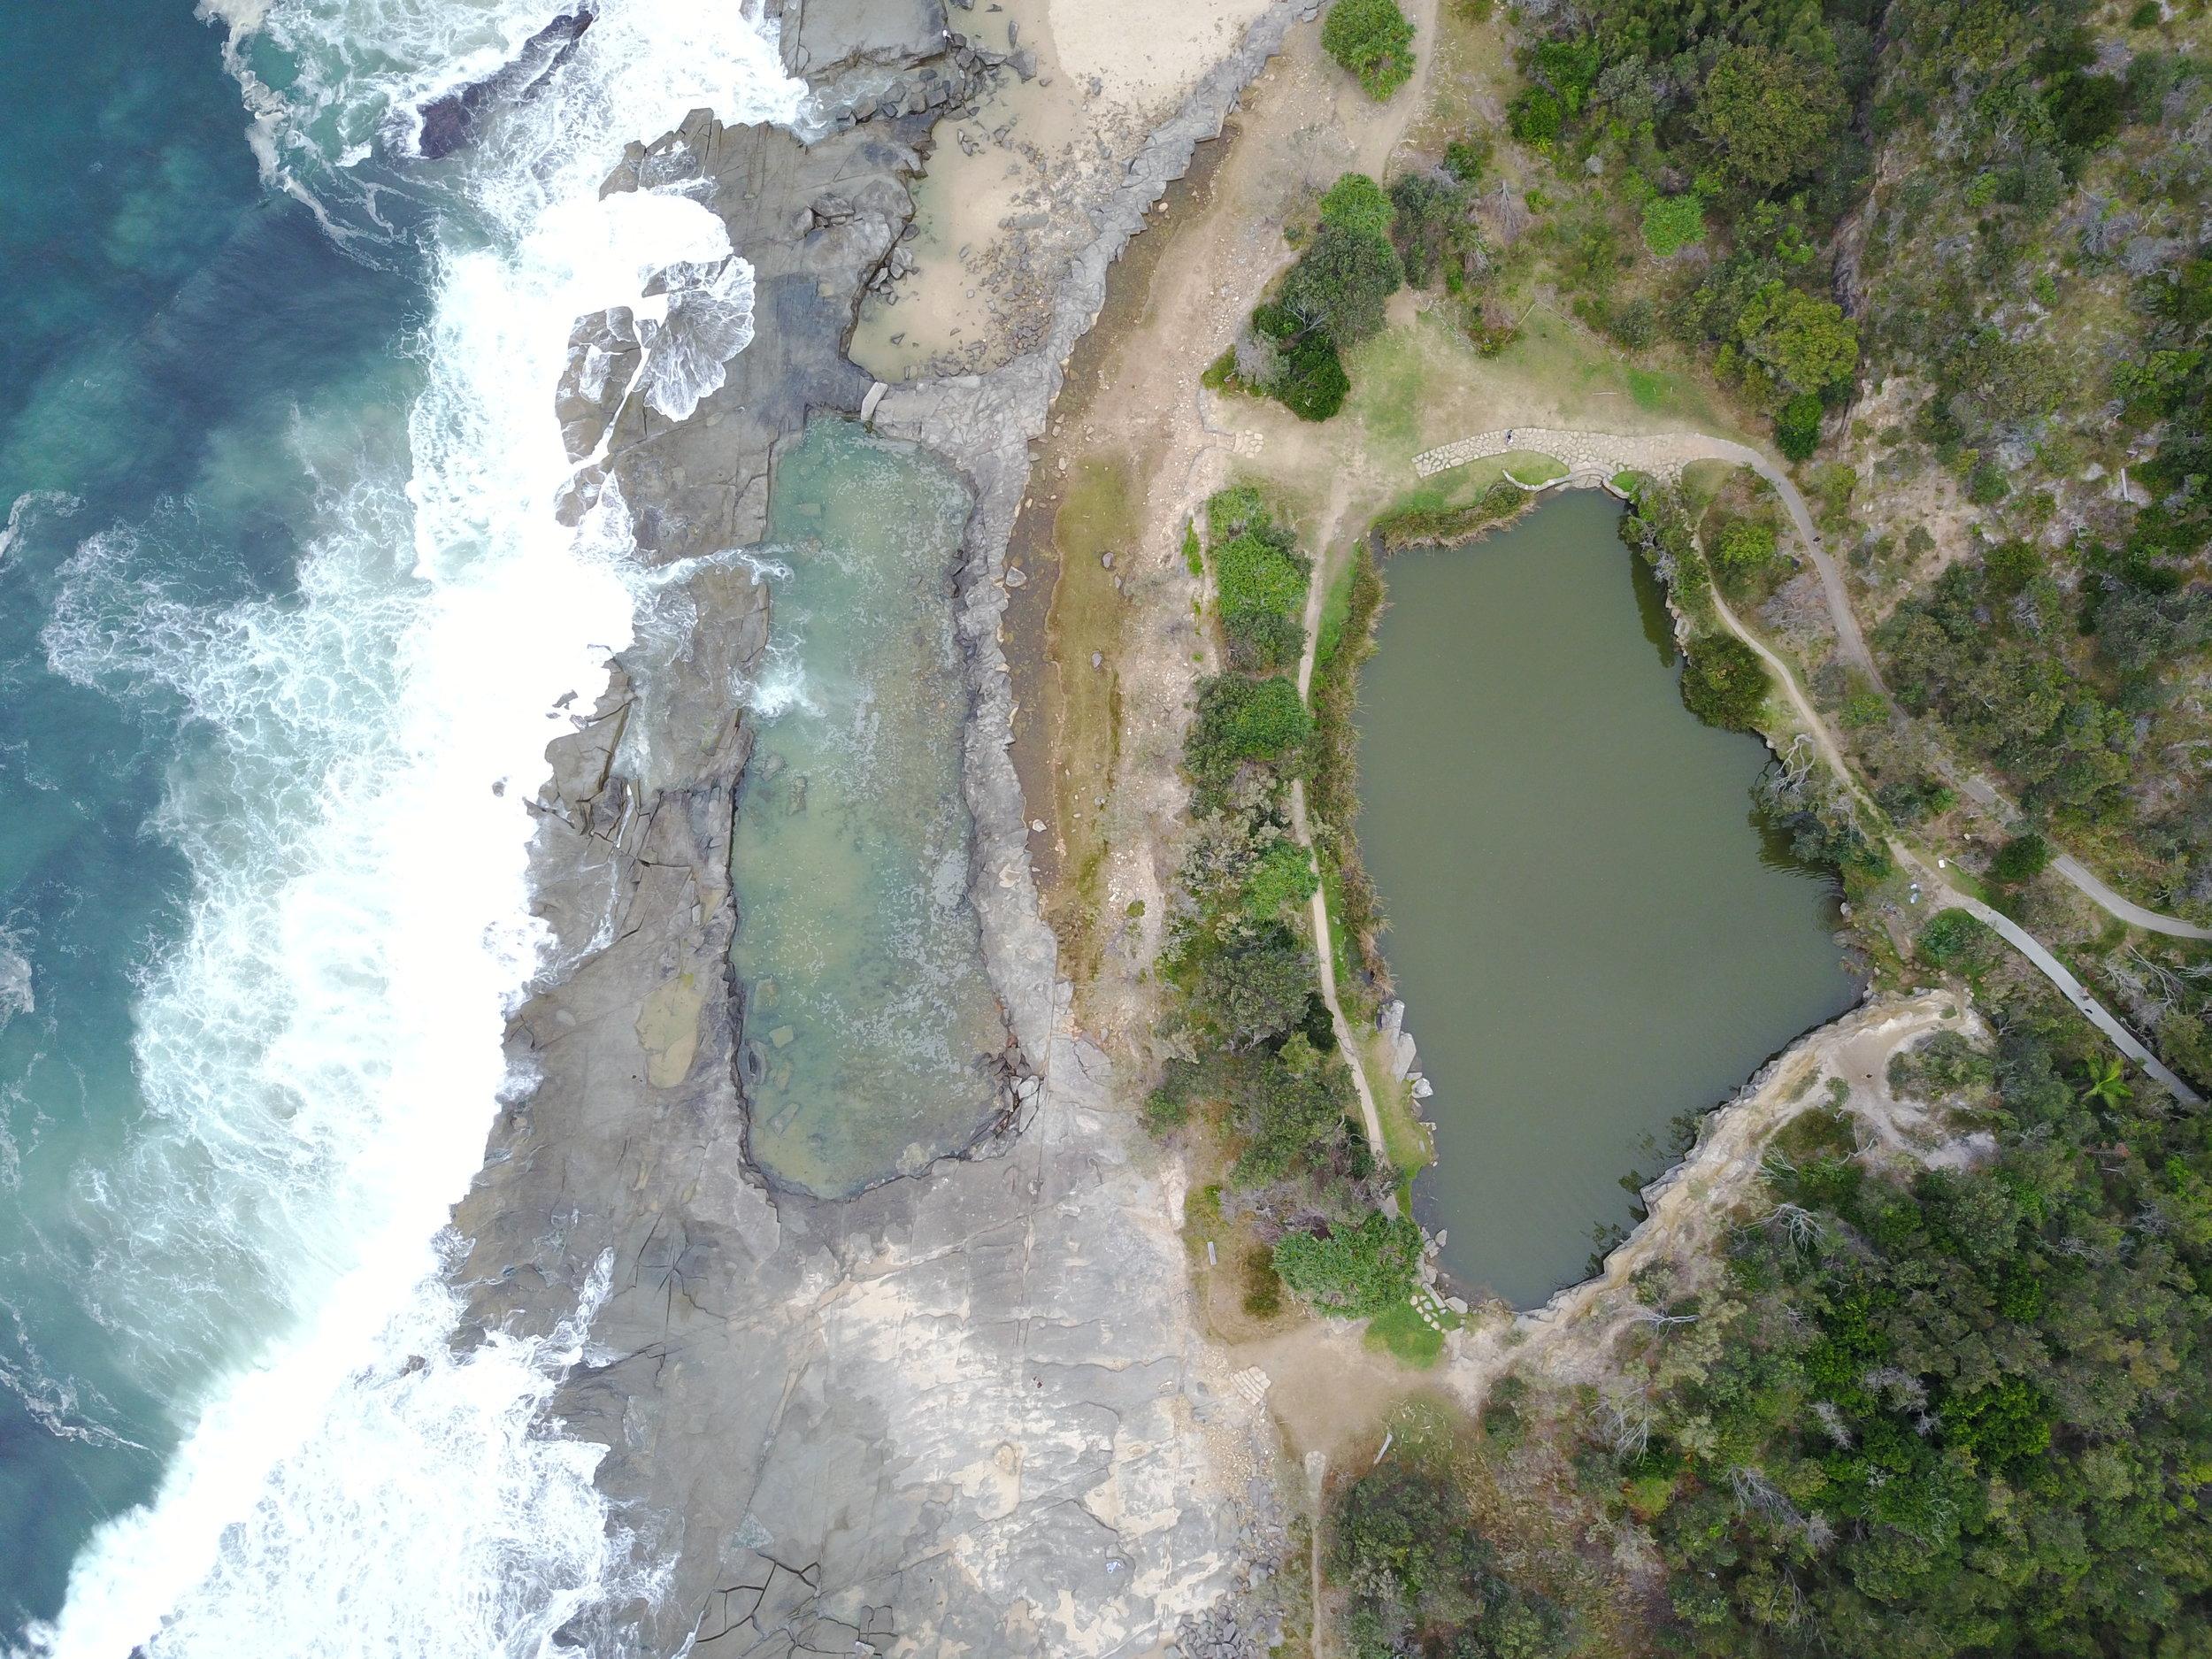 angourie - angourie blue pool, nsw